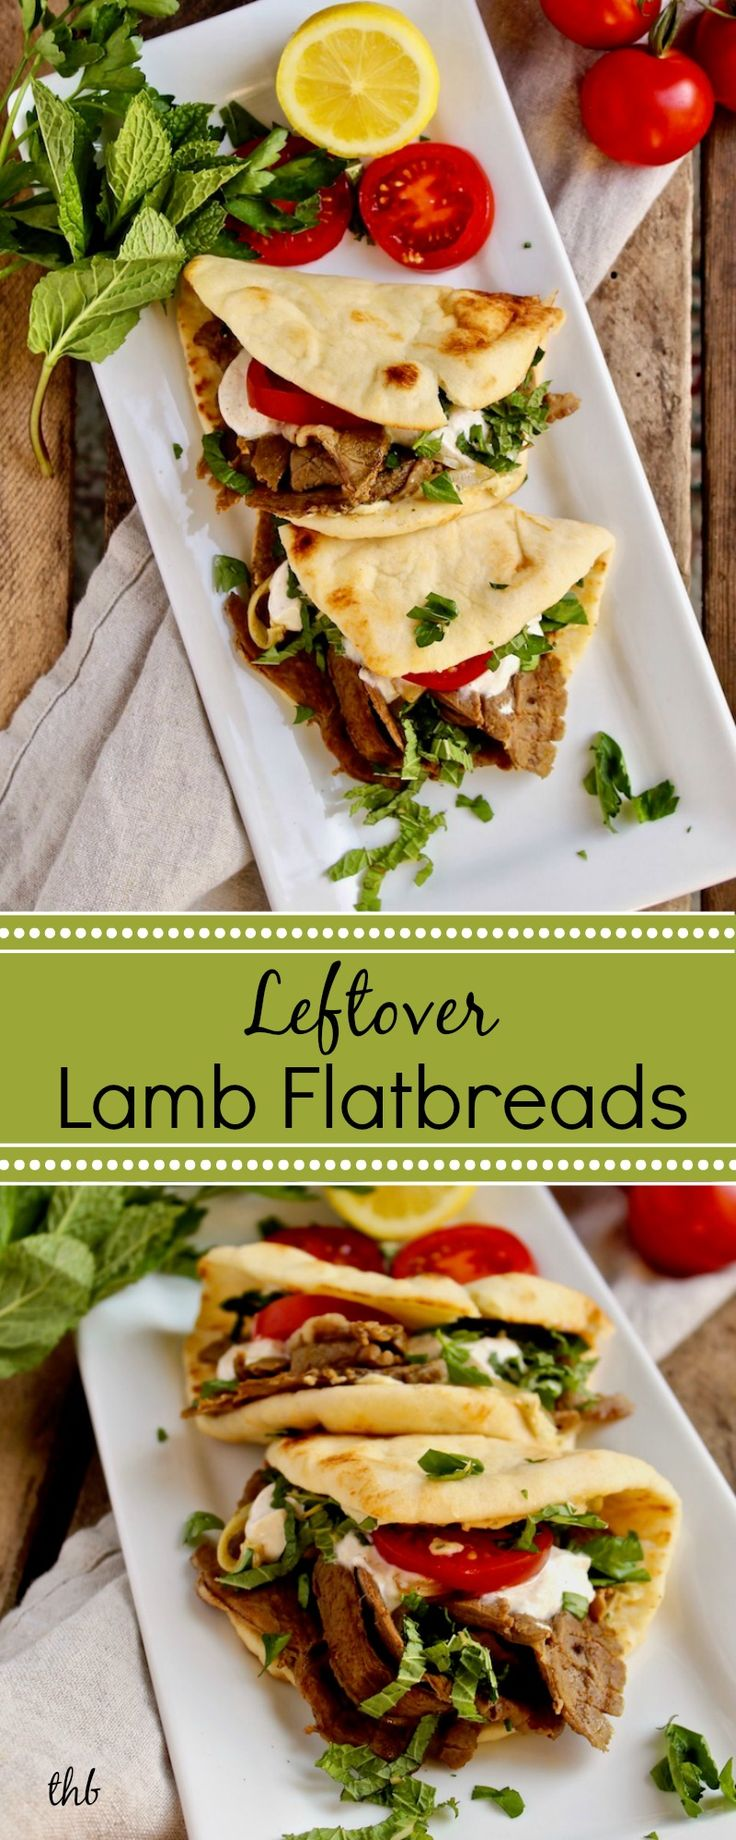 Leftover Lamb Flatbreads